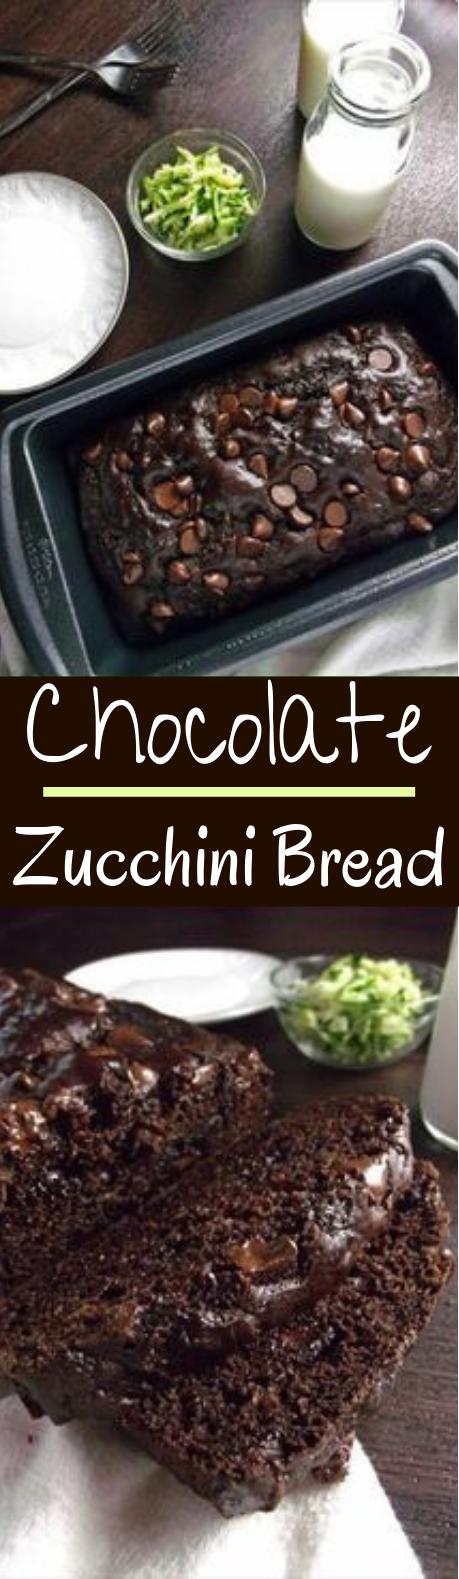 Healthy Chocolate Zucchini Bread #cake #baking